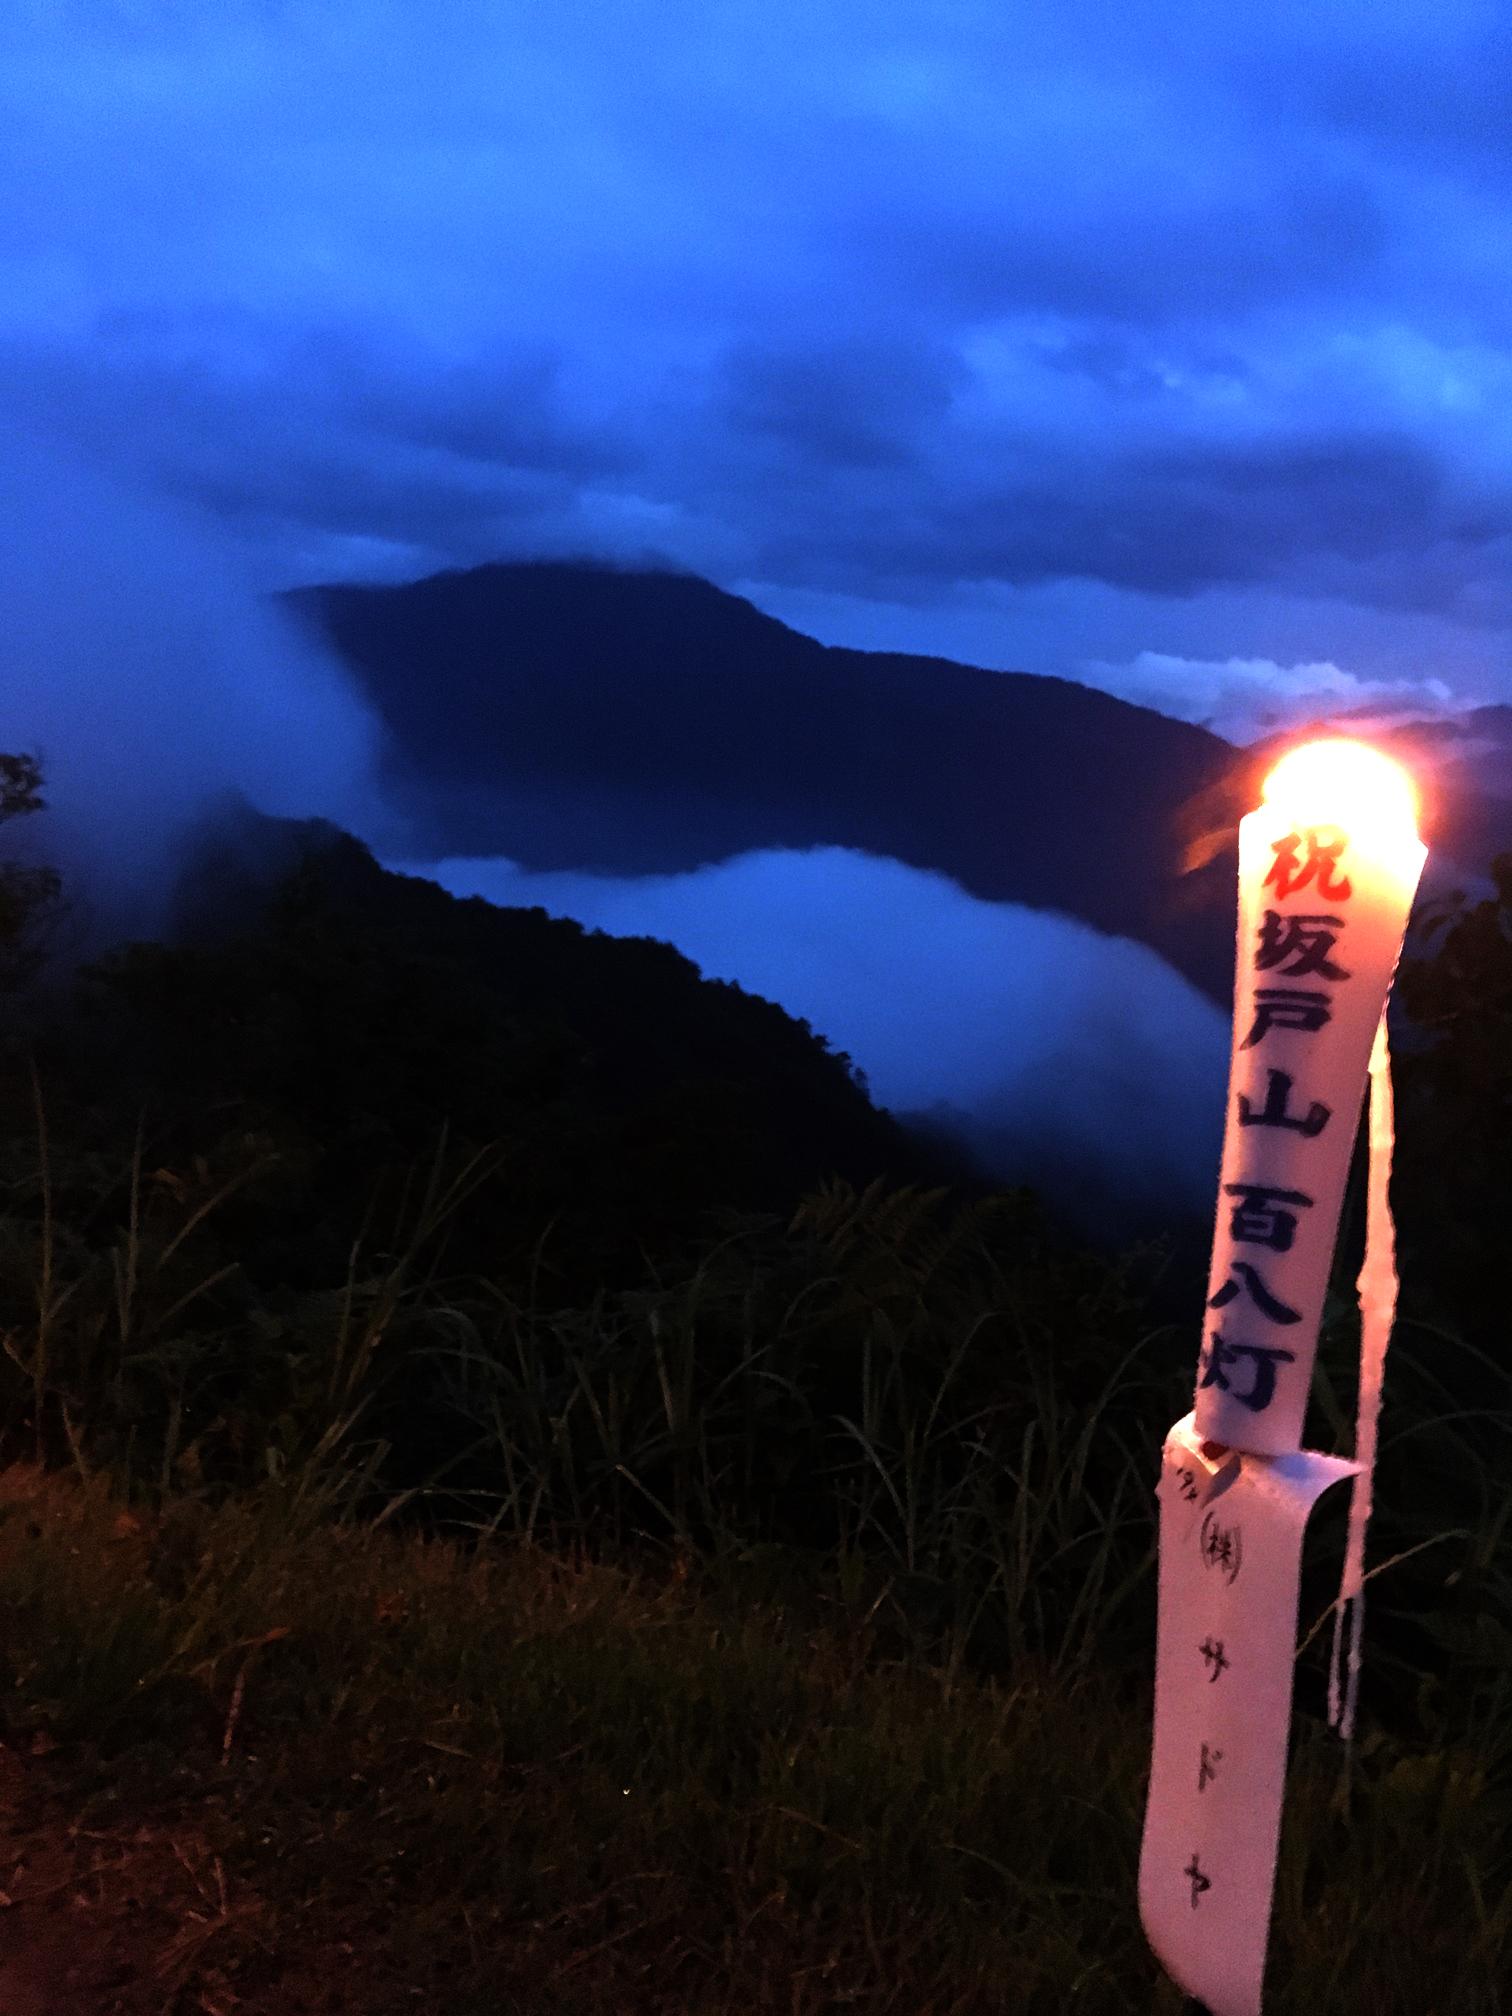 2017.6.30 fri. 坂戸山山開き・百八灯 と雨上がりの雲海|新潟南魚沼坂戸山